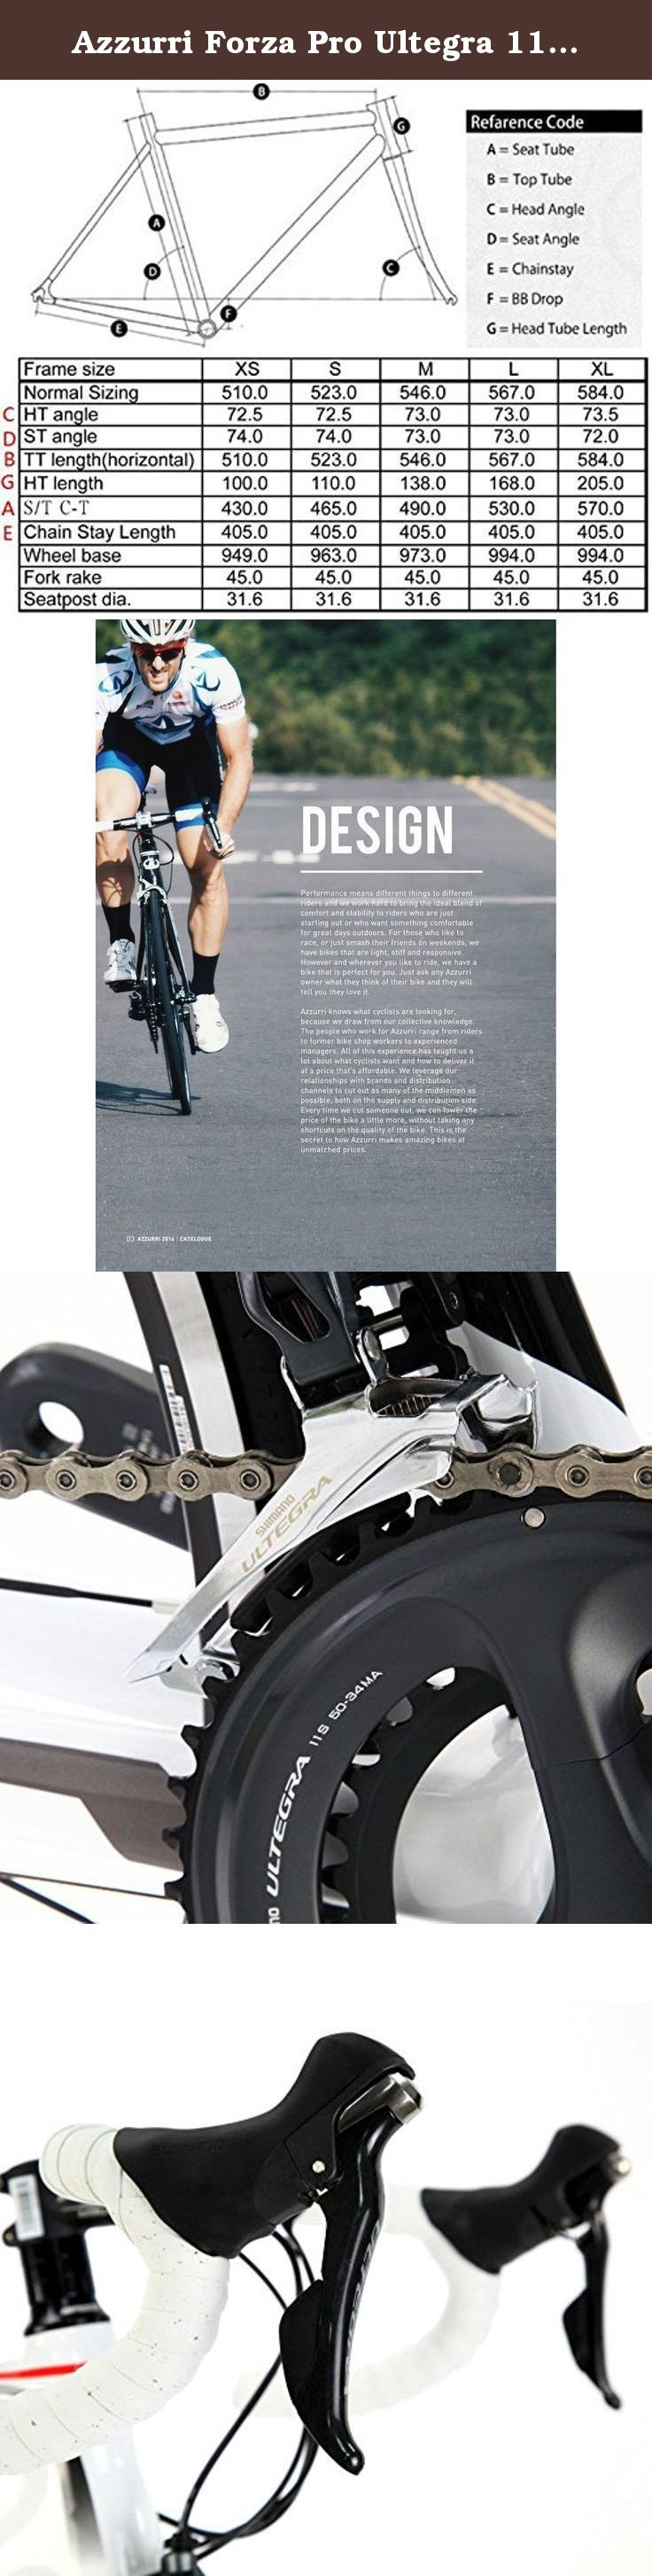 Azzurri Forza Pro Ultegra 11 Carbon Road Bike 2015 Size Xl The